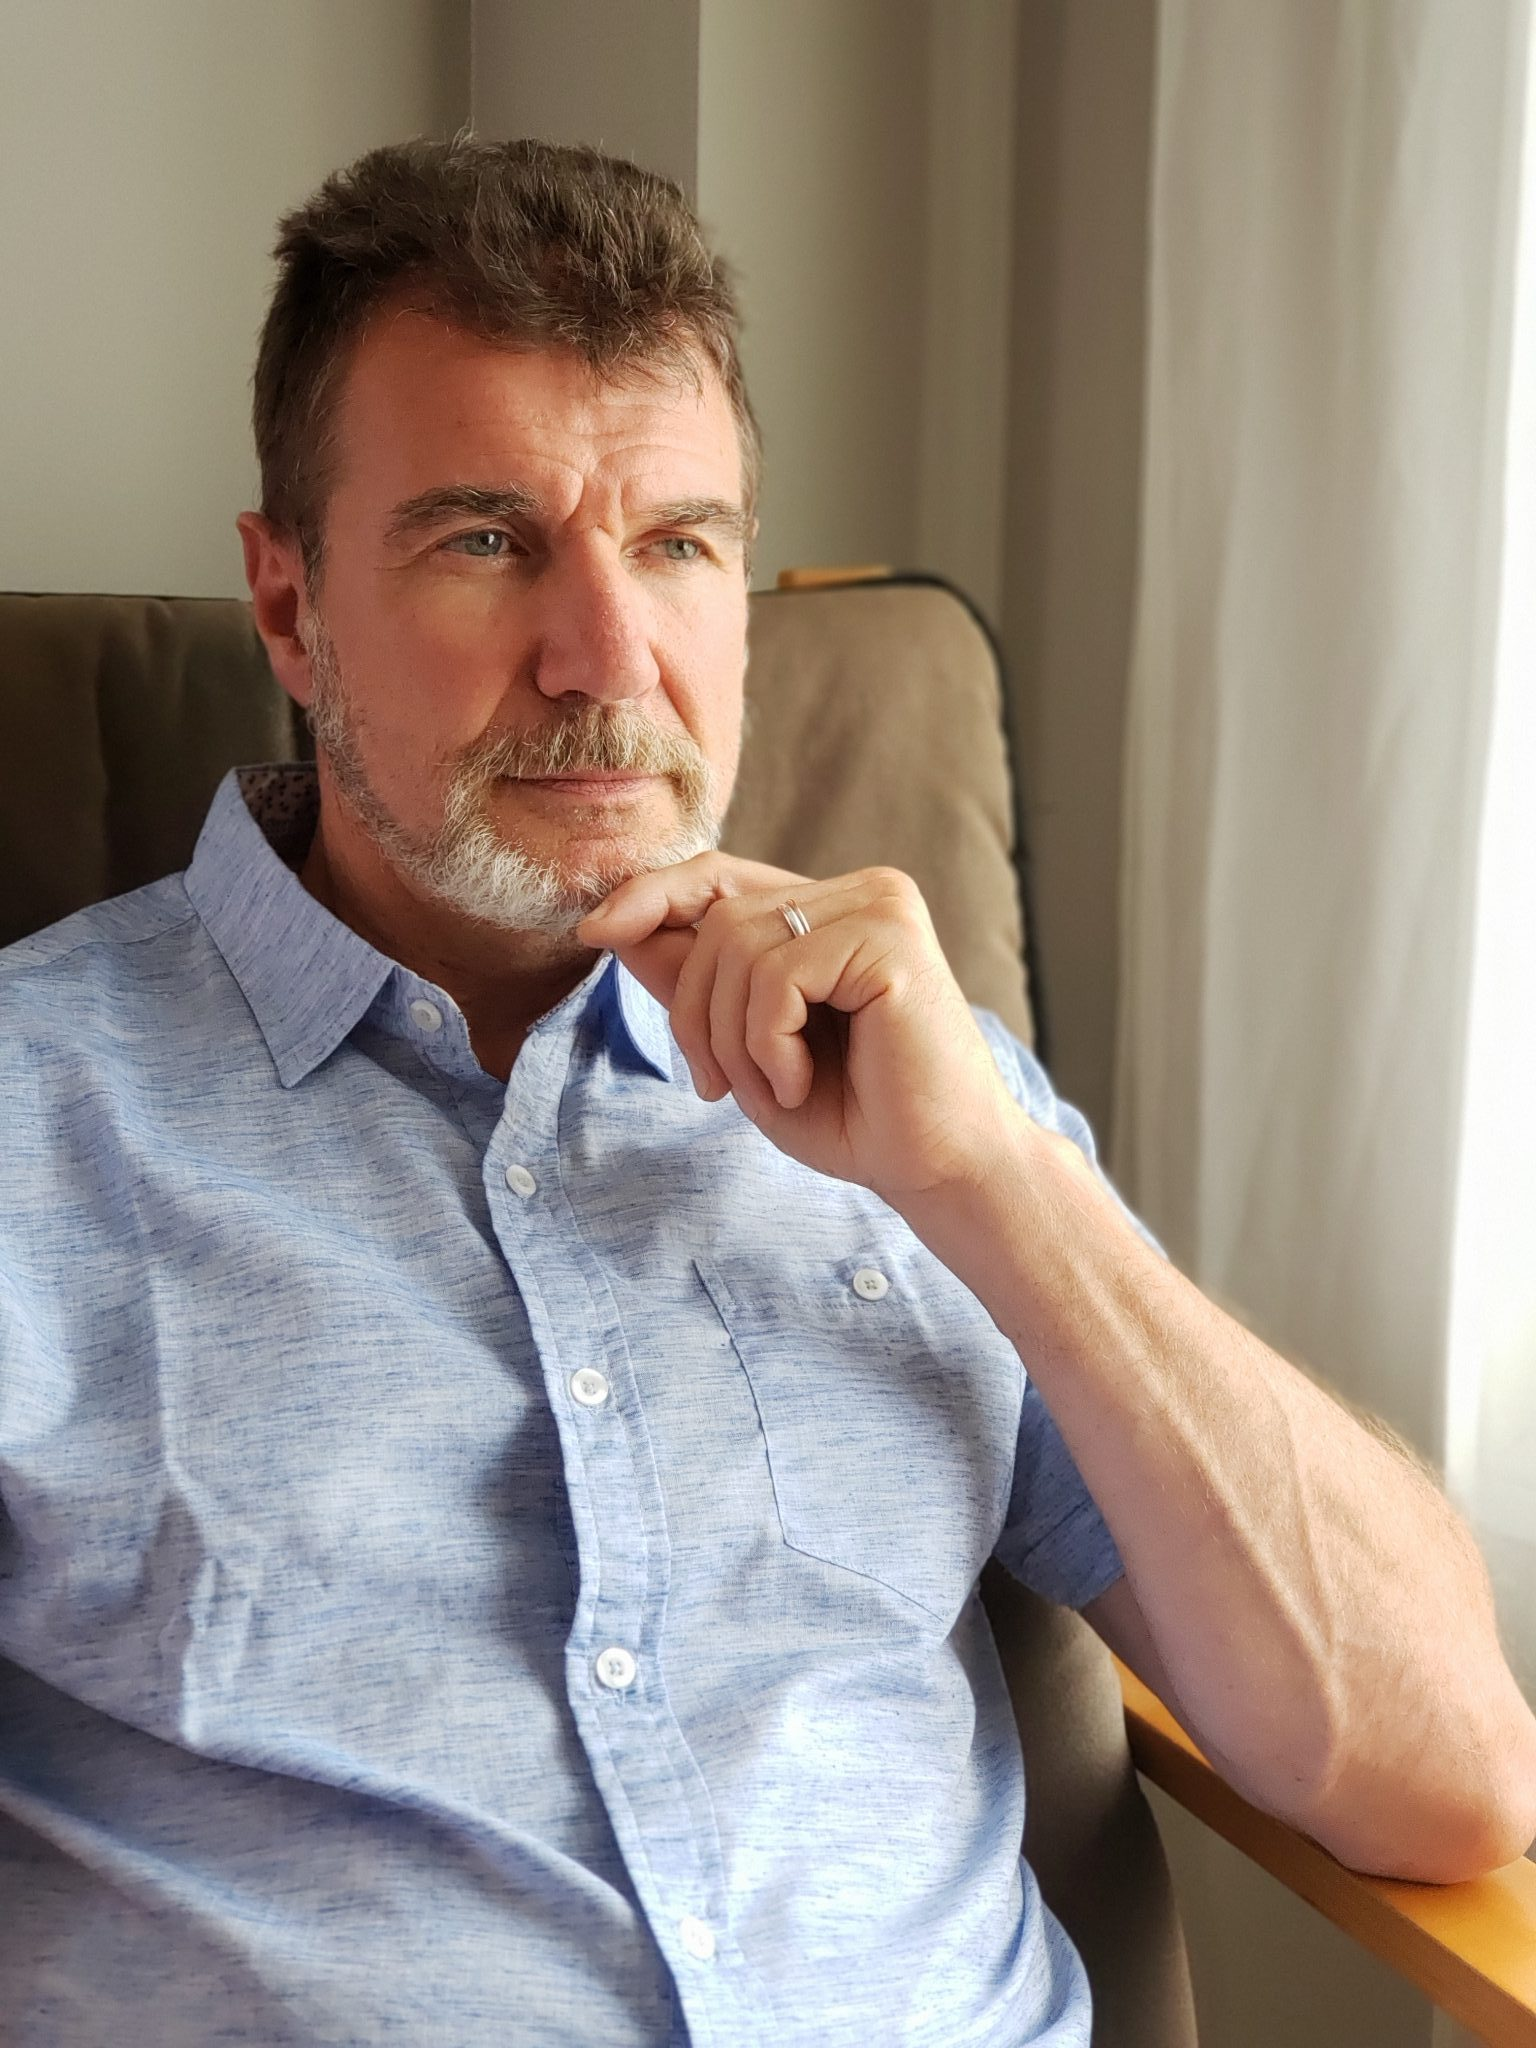 Cedric Gehder, 55